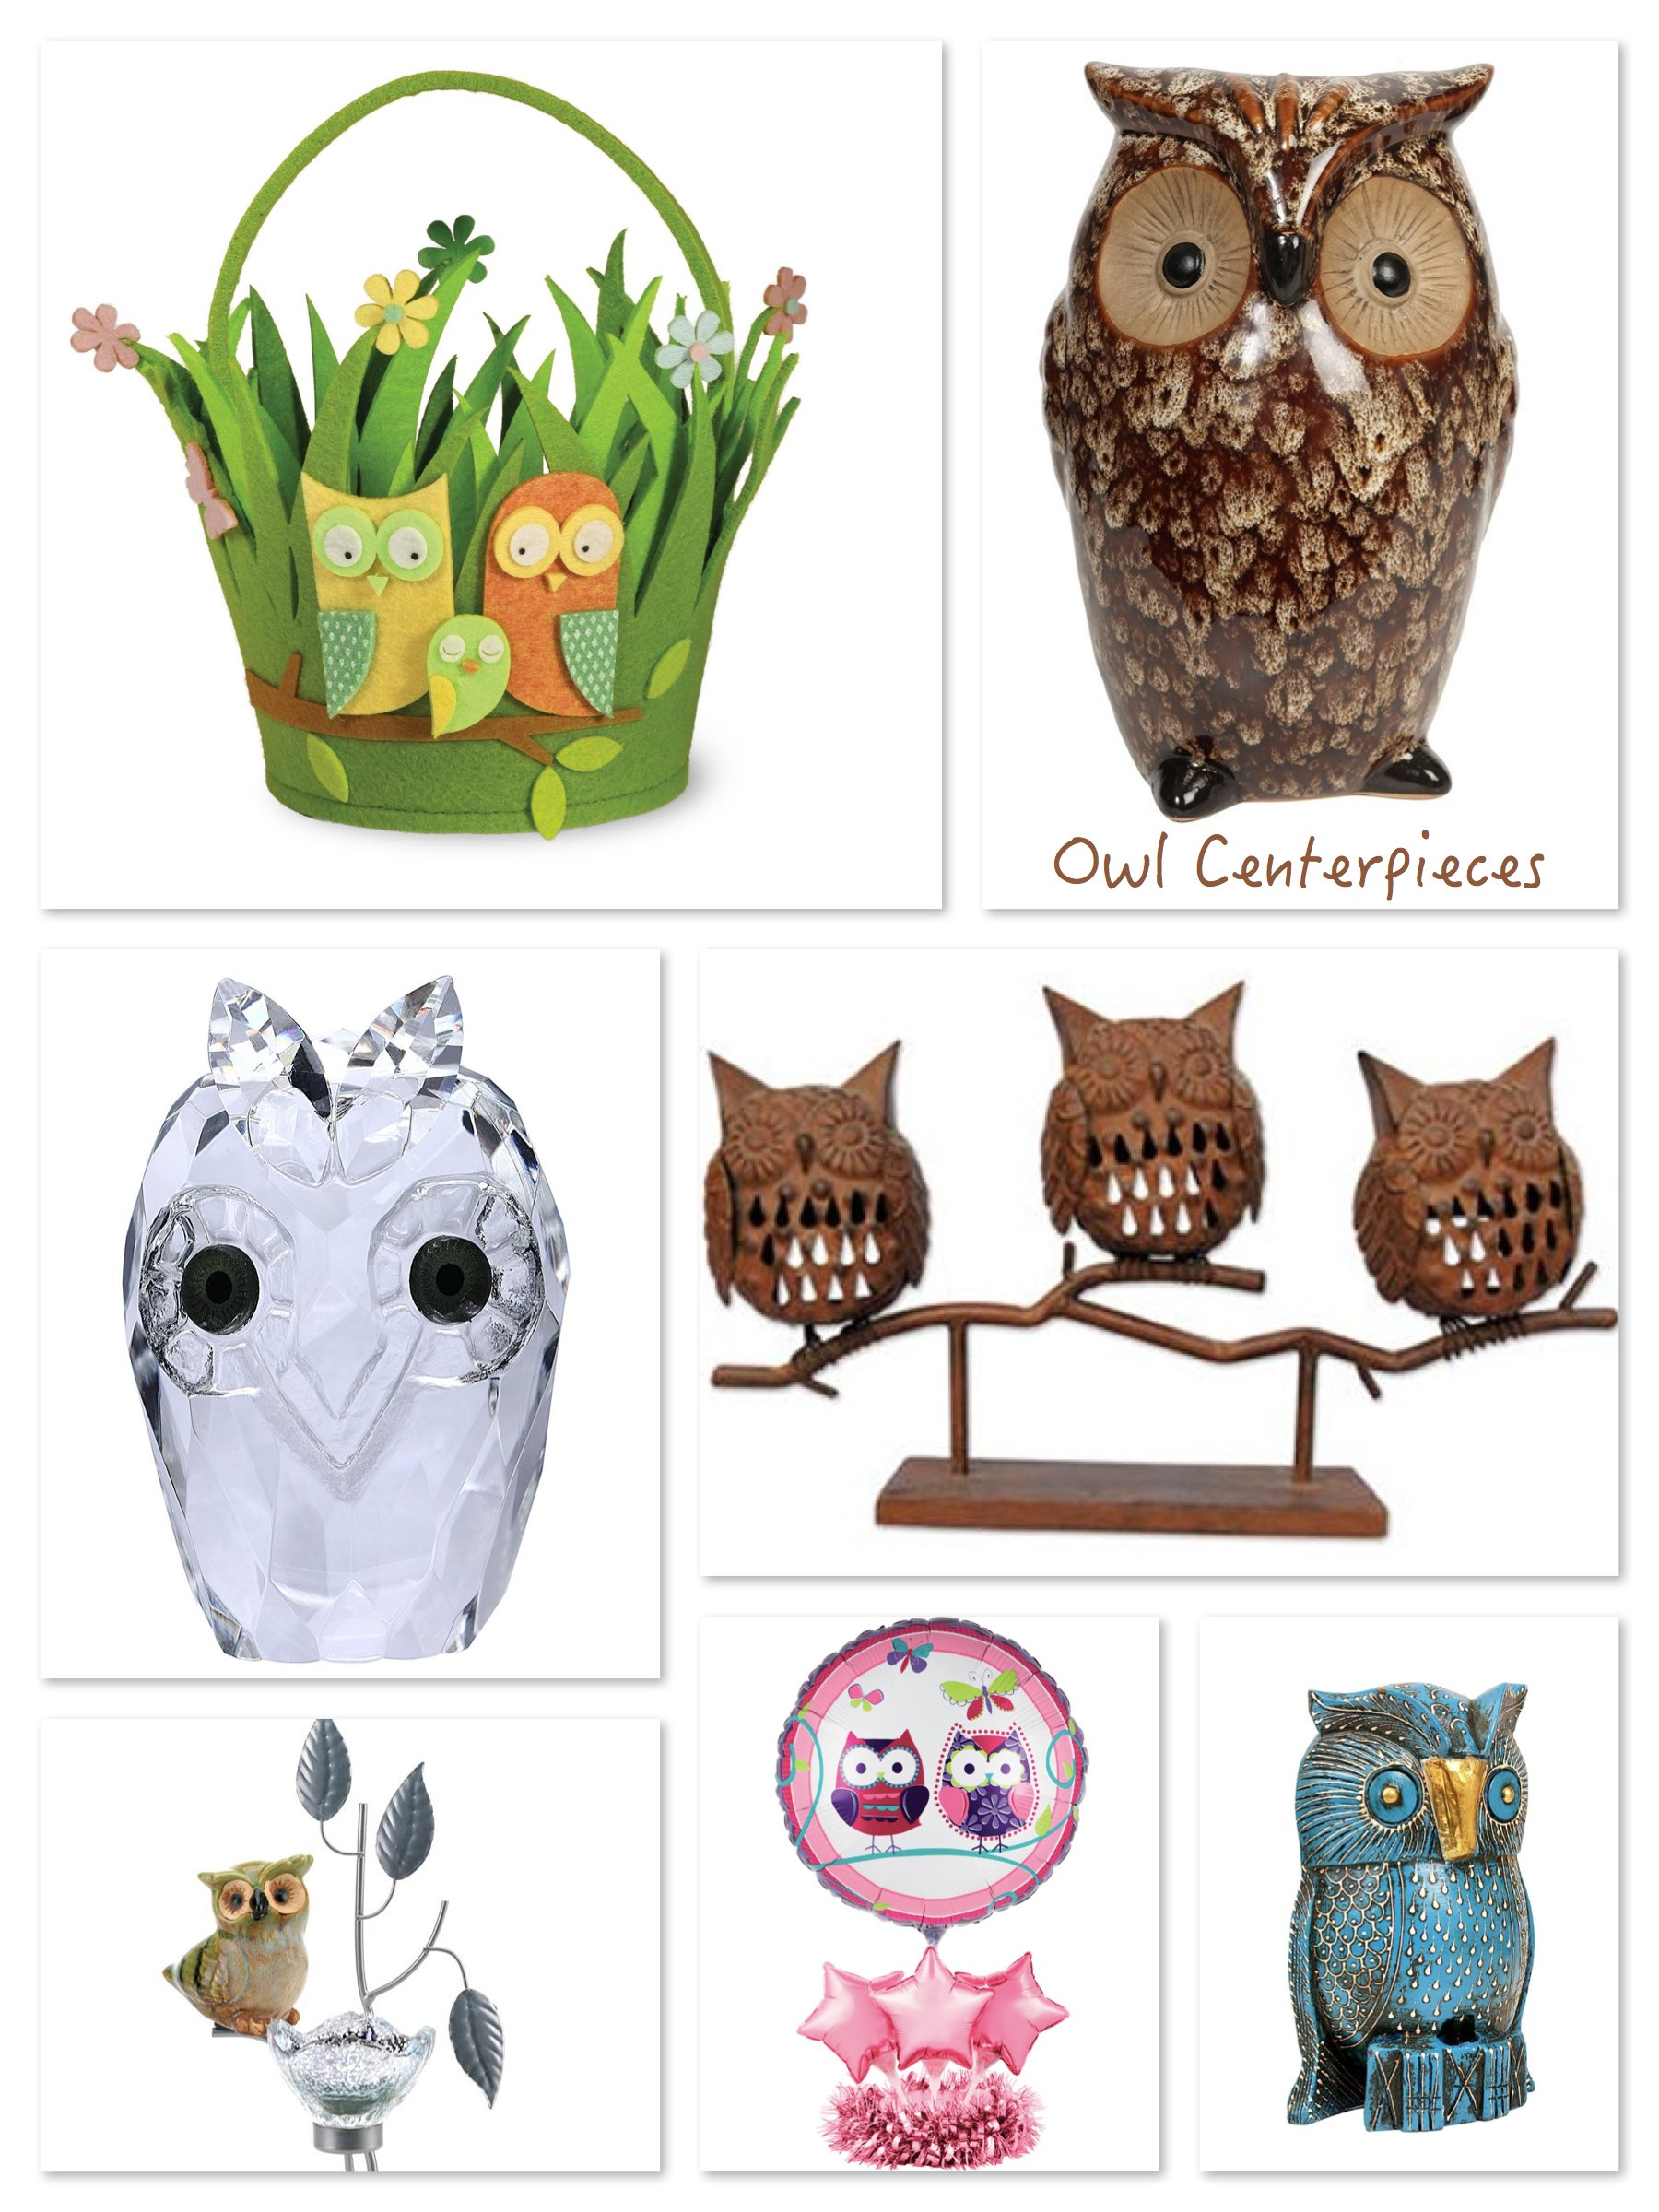 Owl Centerpieces